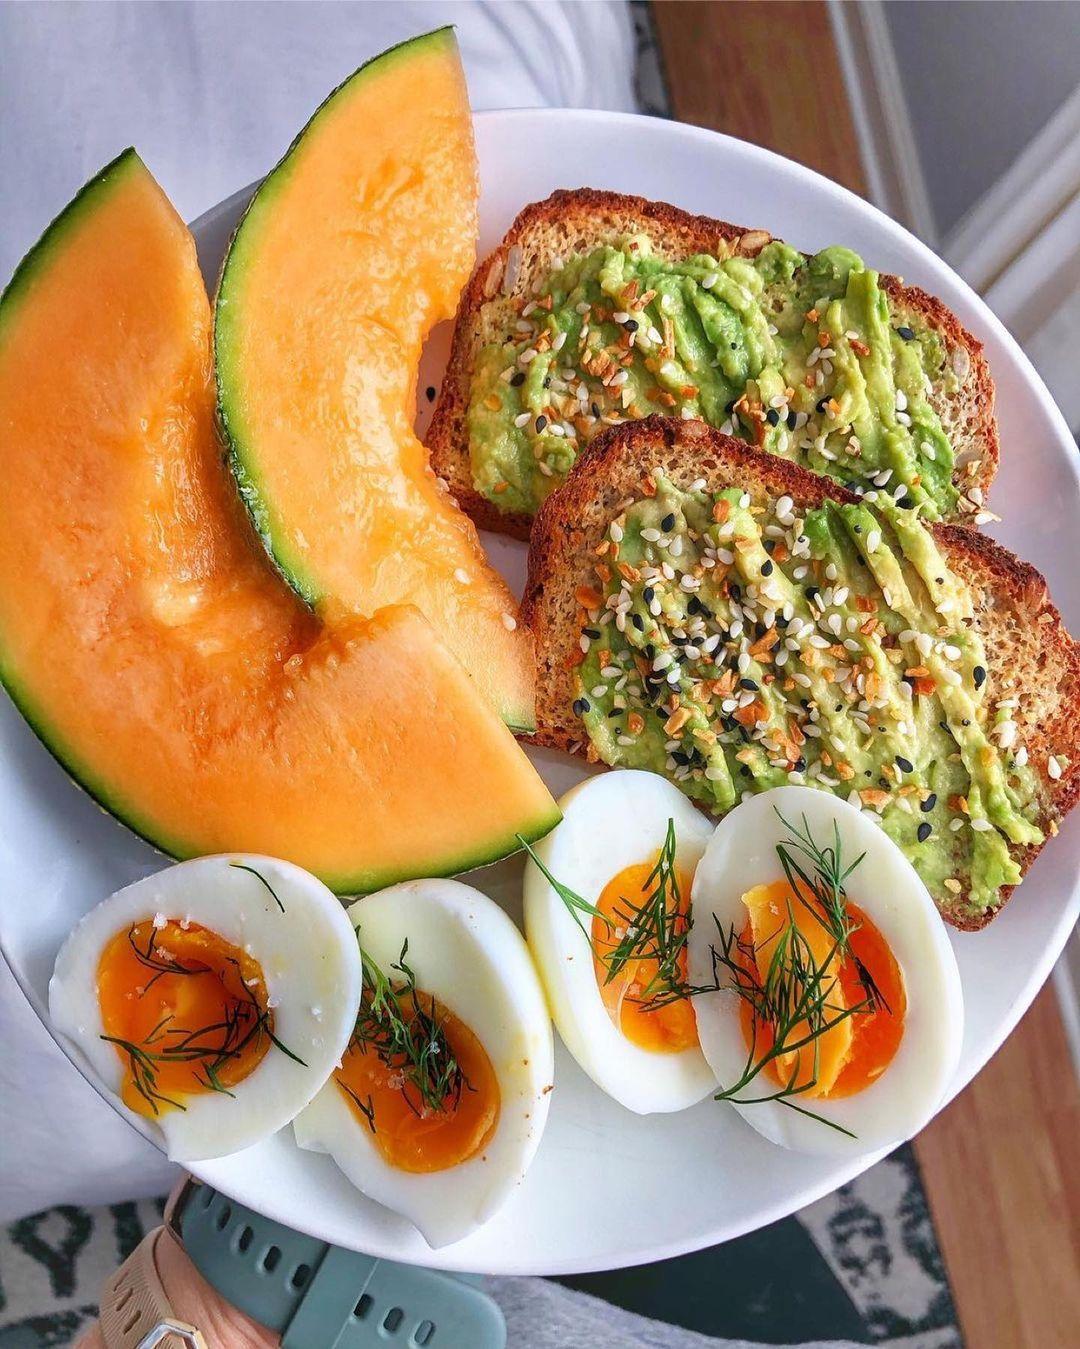 Toast w avo and everything seasoning boiled eggs and cantaloupe by @nurturingbodyandmind